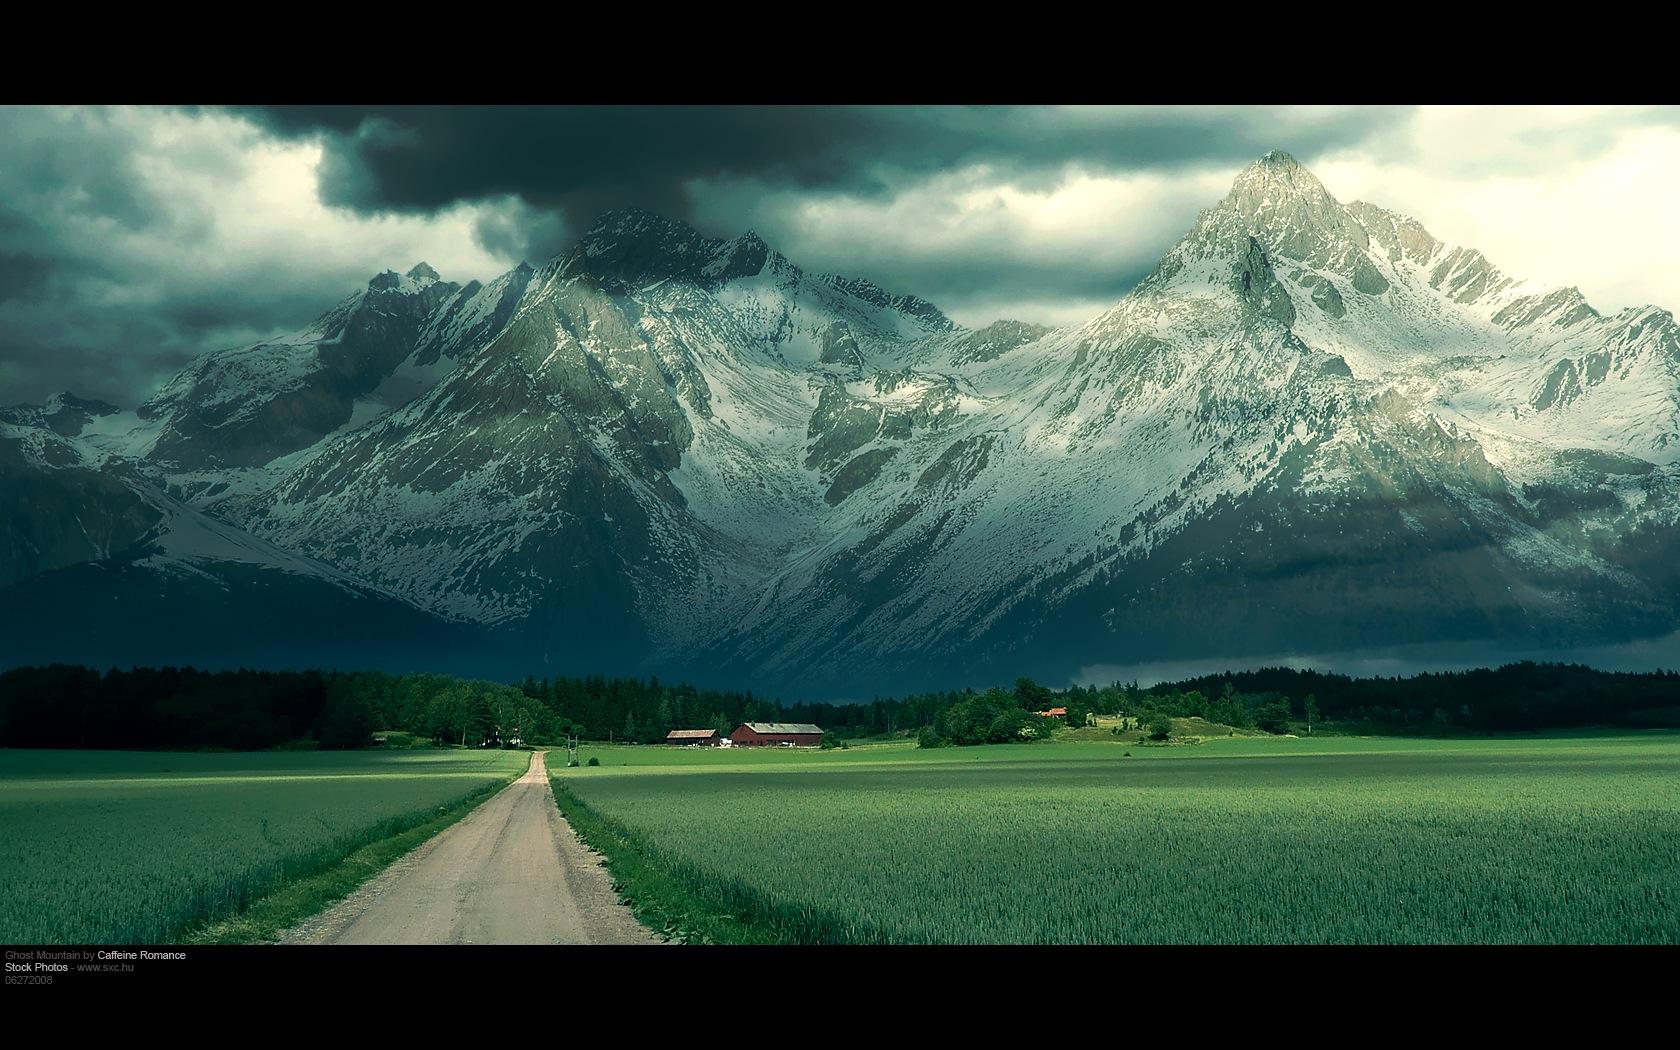 Hd wallpaper mountains -  Com Mountain Desktop Wallpaper Hd Mountain